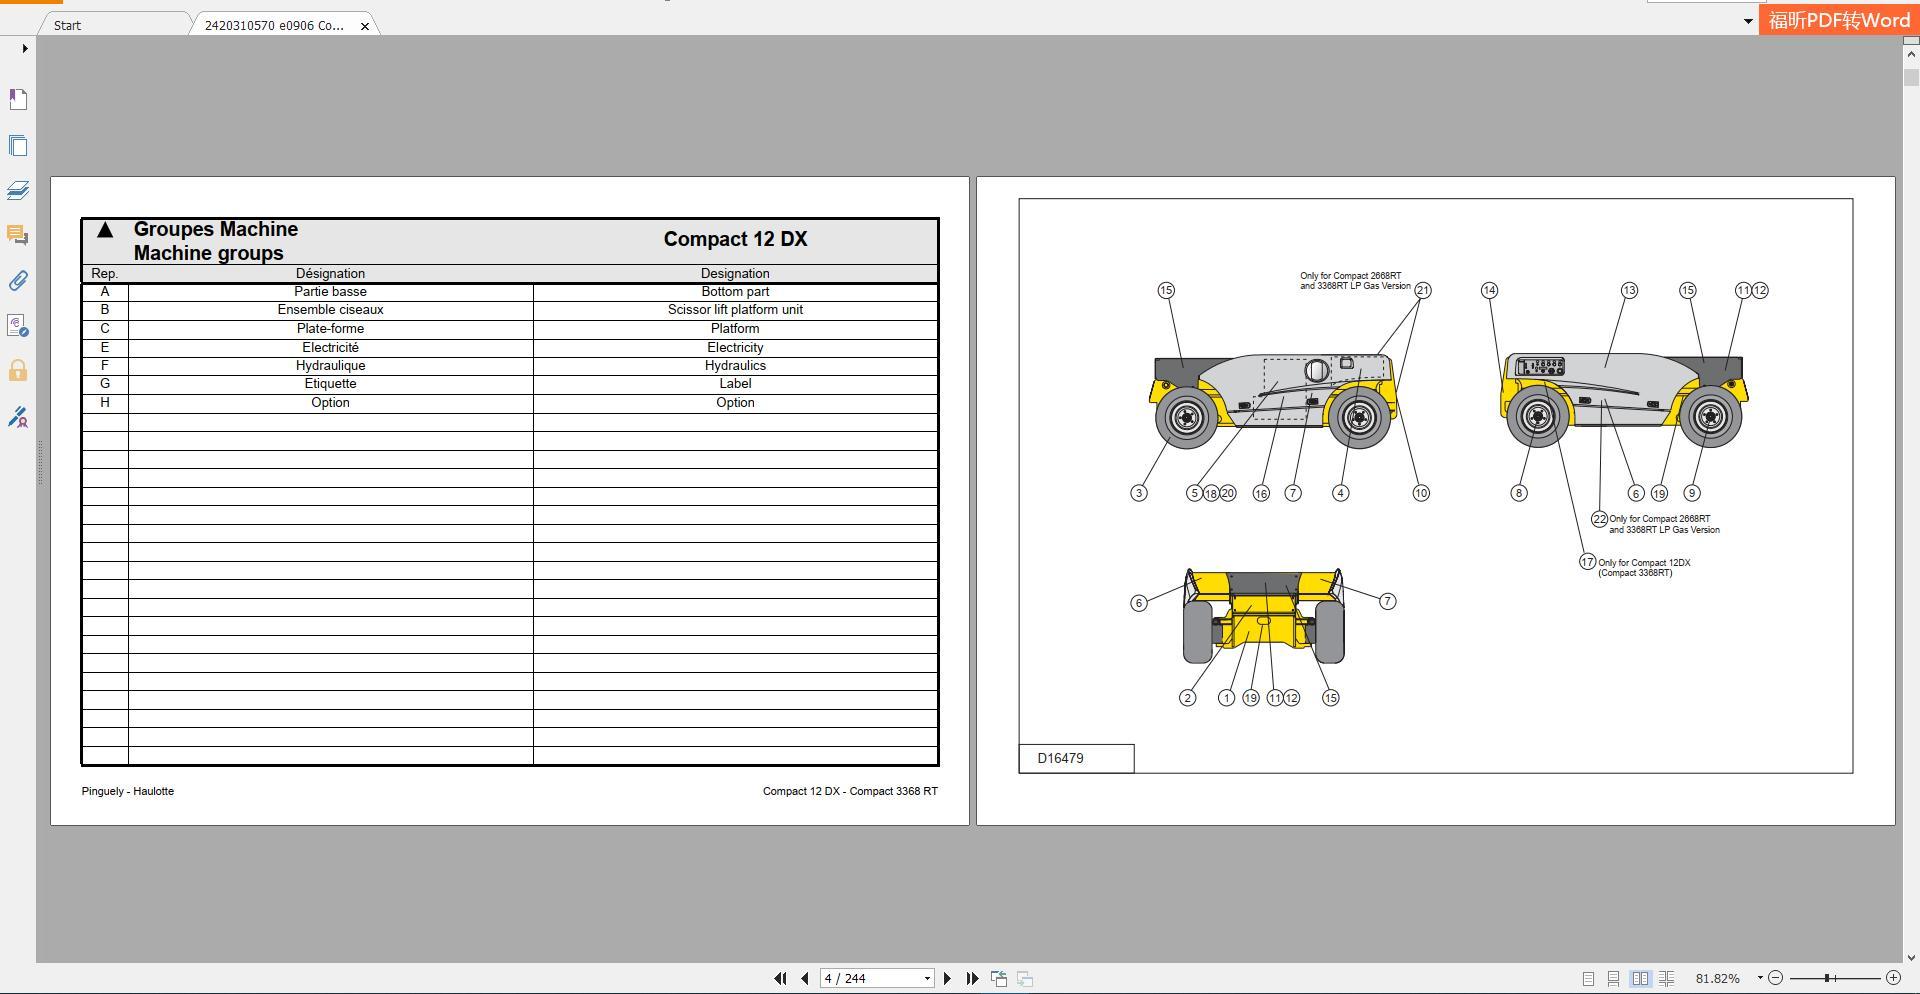 Haulotte_Work_Platforms_and_Telehandlers_Service_Maintenance_Operators_Manual_Training_Spare_Parts_Manual_DVD9